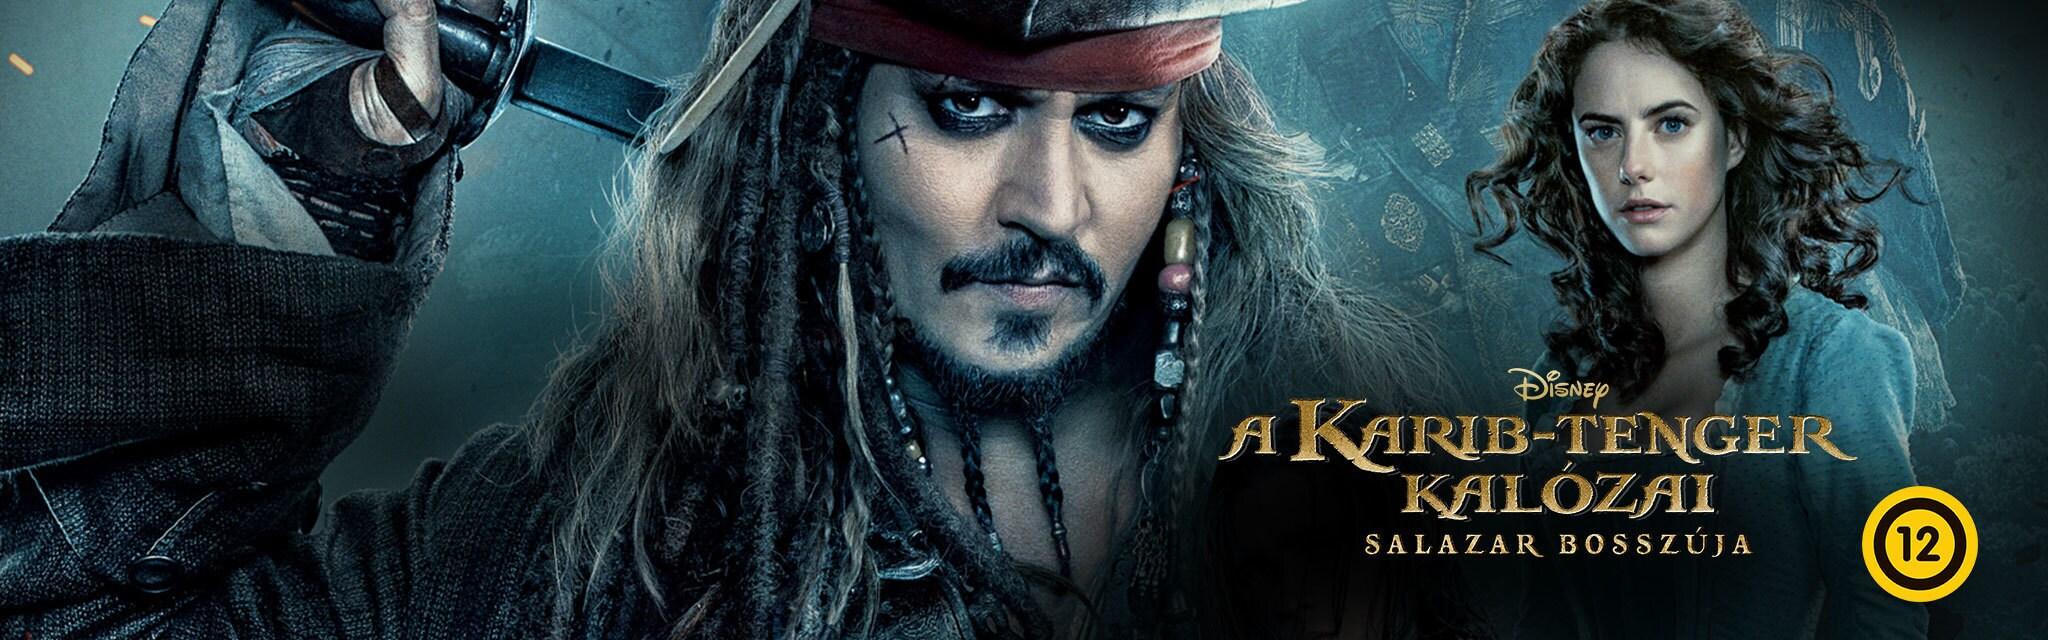 FW Hero - Pirates of the Caribbean 5 - In Cinemas